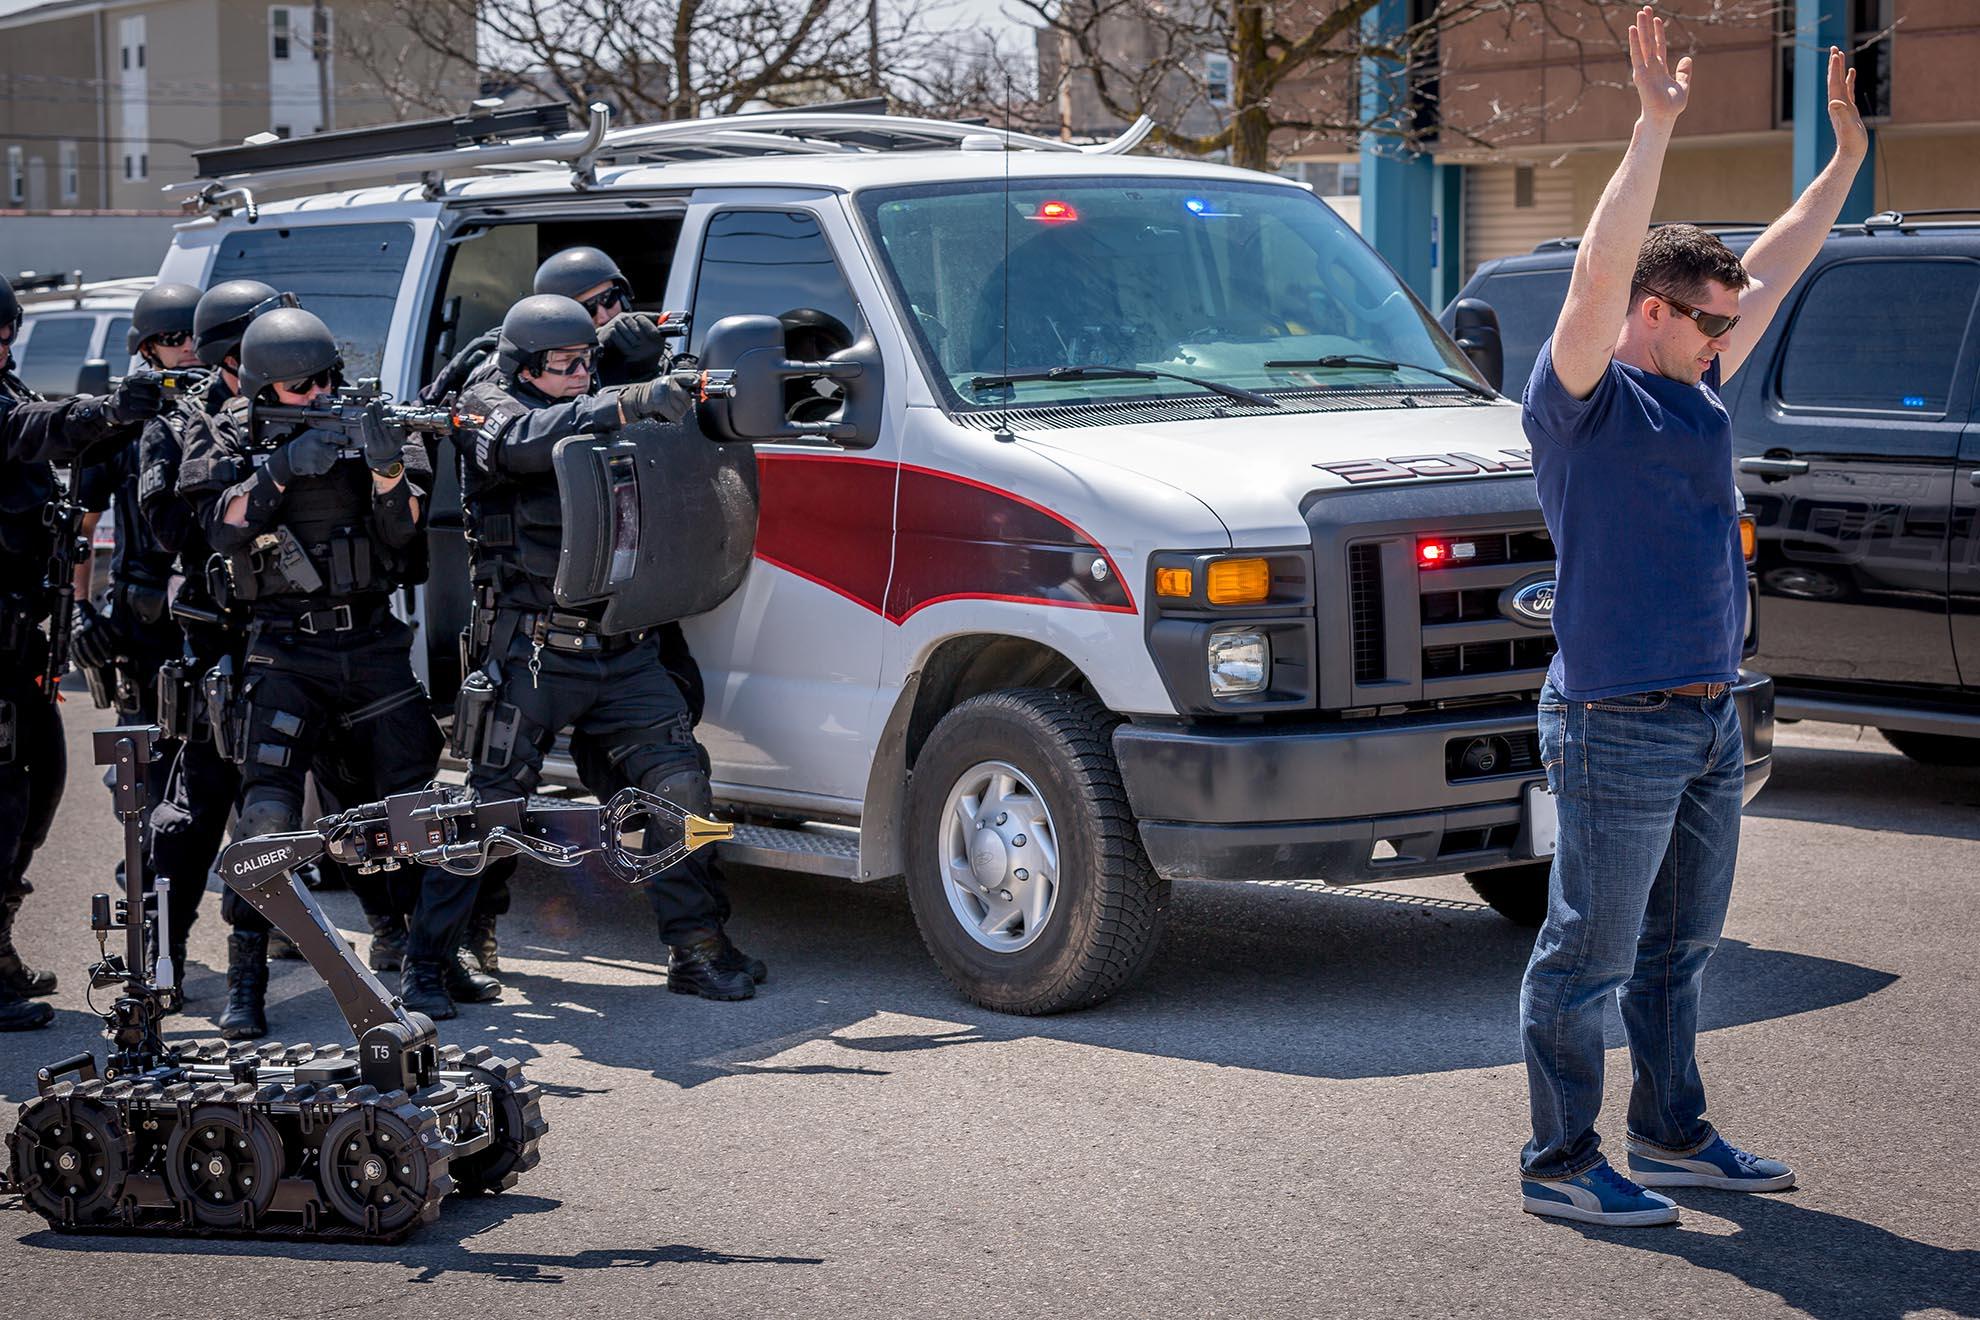 caliber-t5-swat-eod-robot-arrest